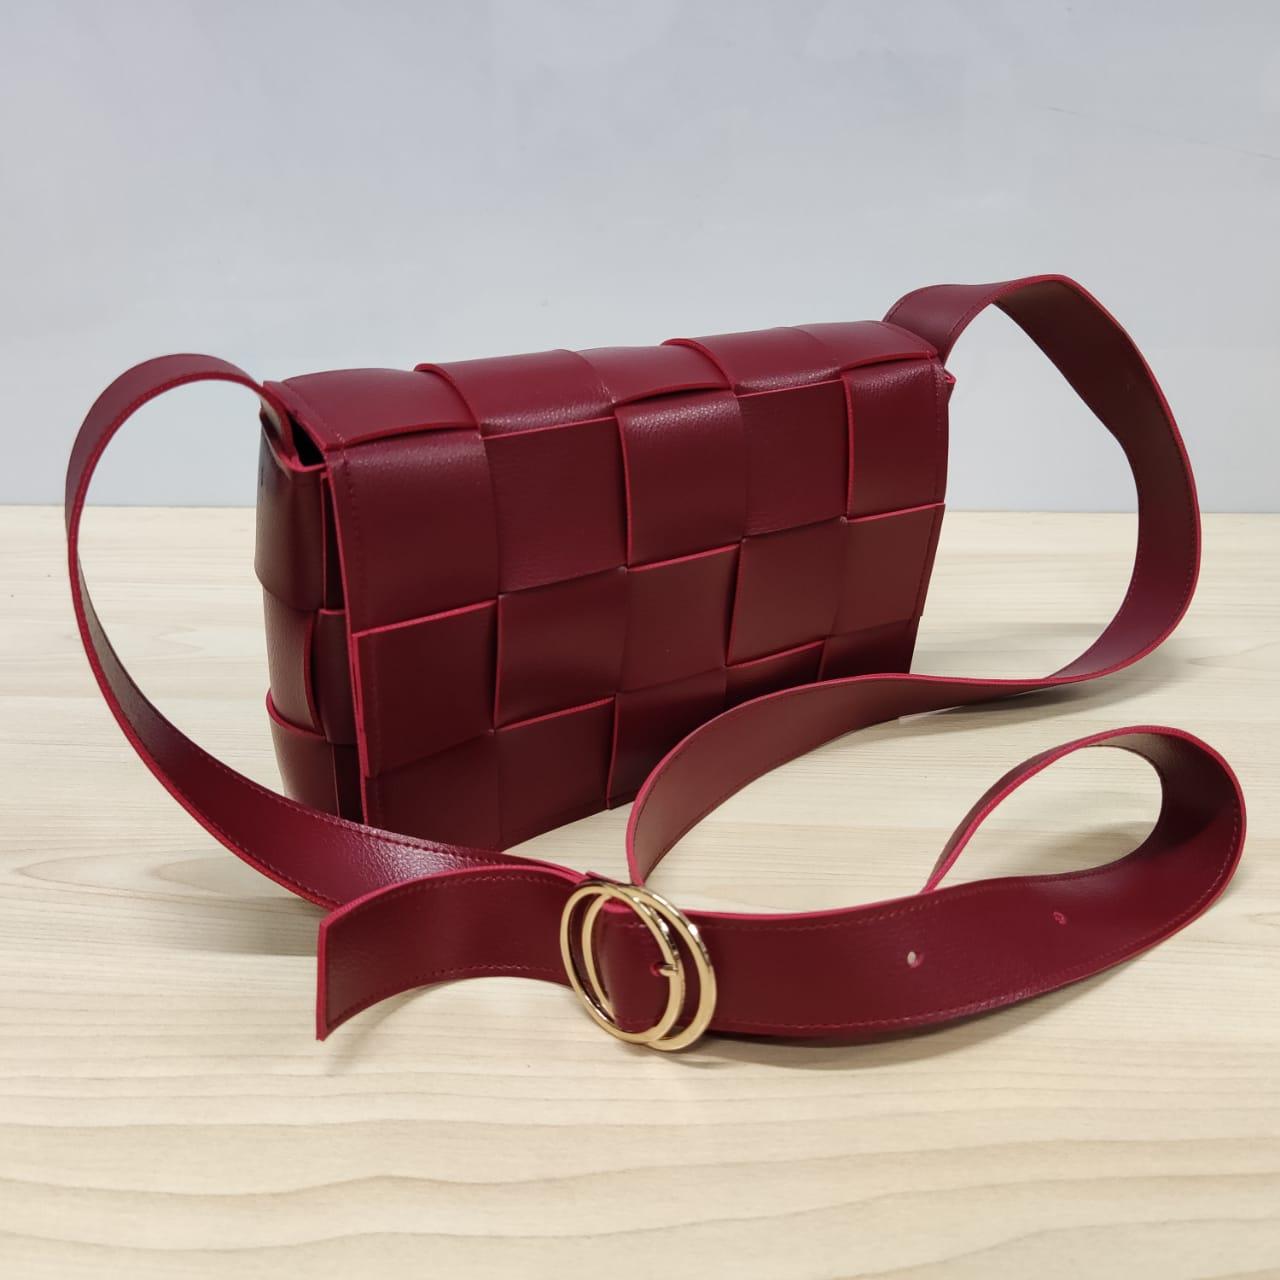 Handbag For Girls Handbags For Ladies Hand Bags Shoulder Bag for Women